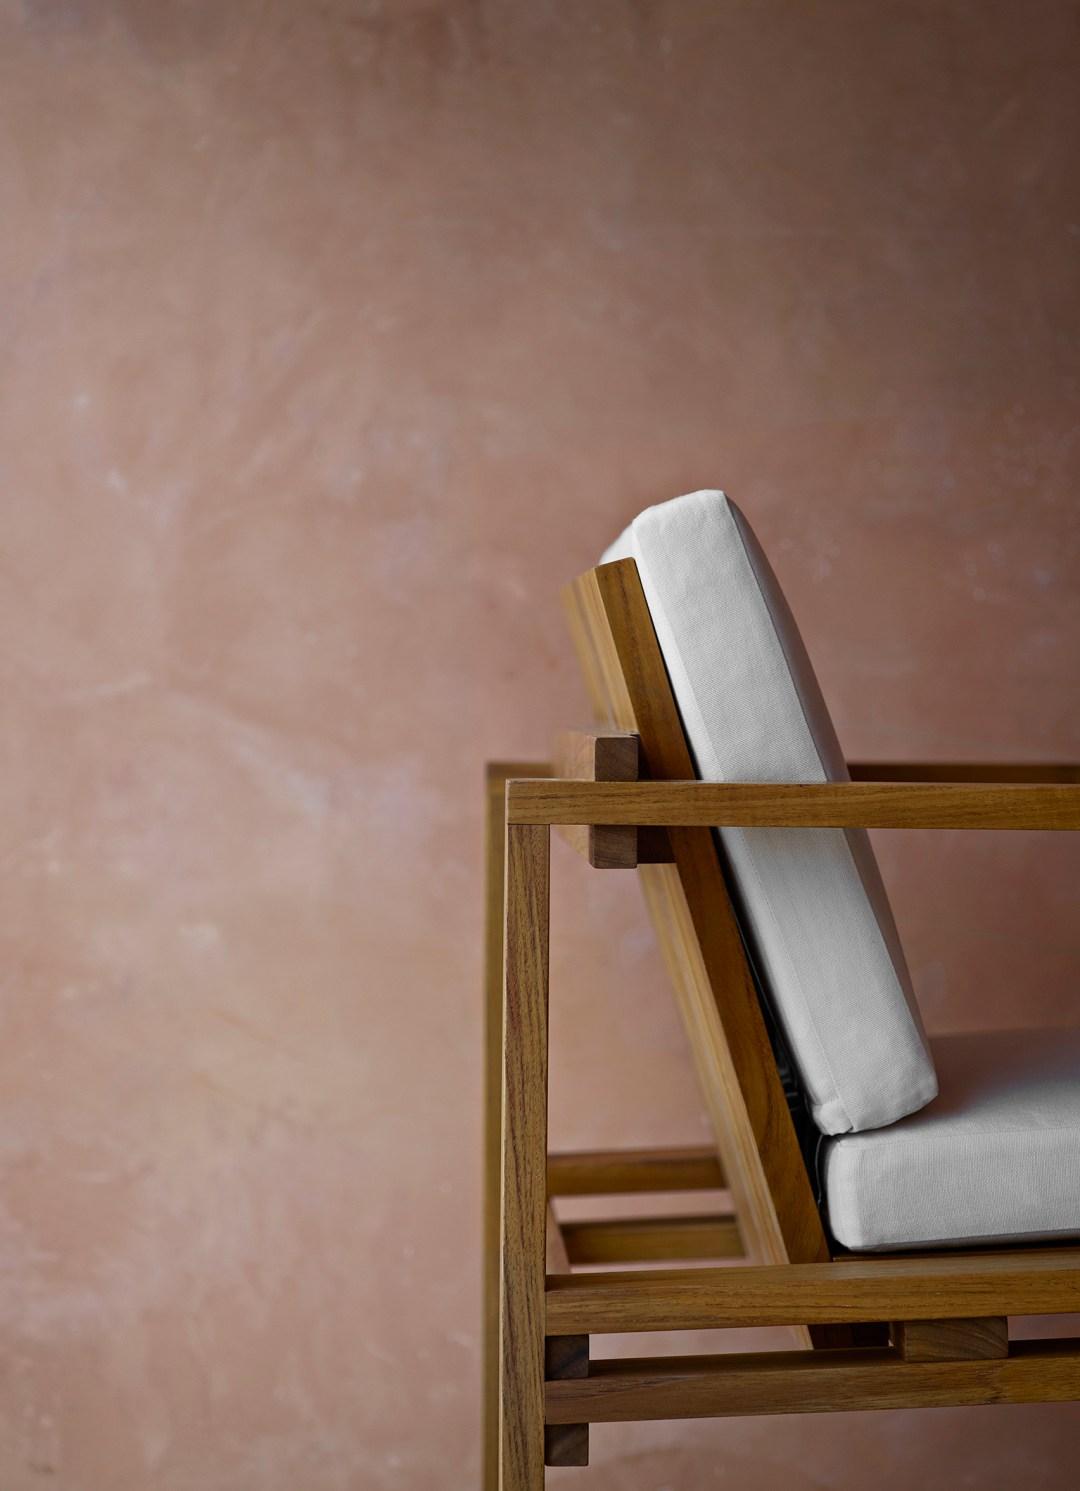 Carl Hansen & Søn's indoor/outdoor collection - with design classics